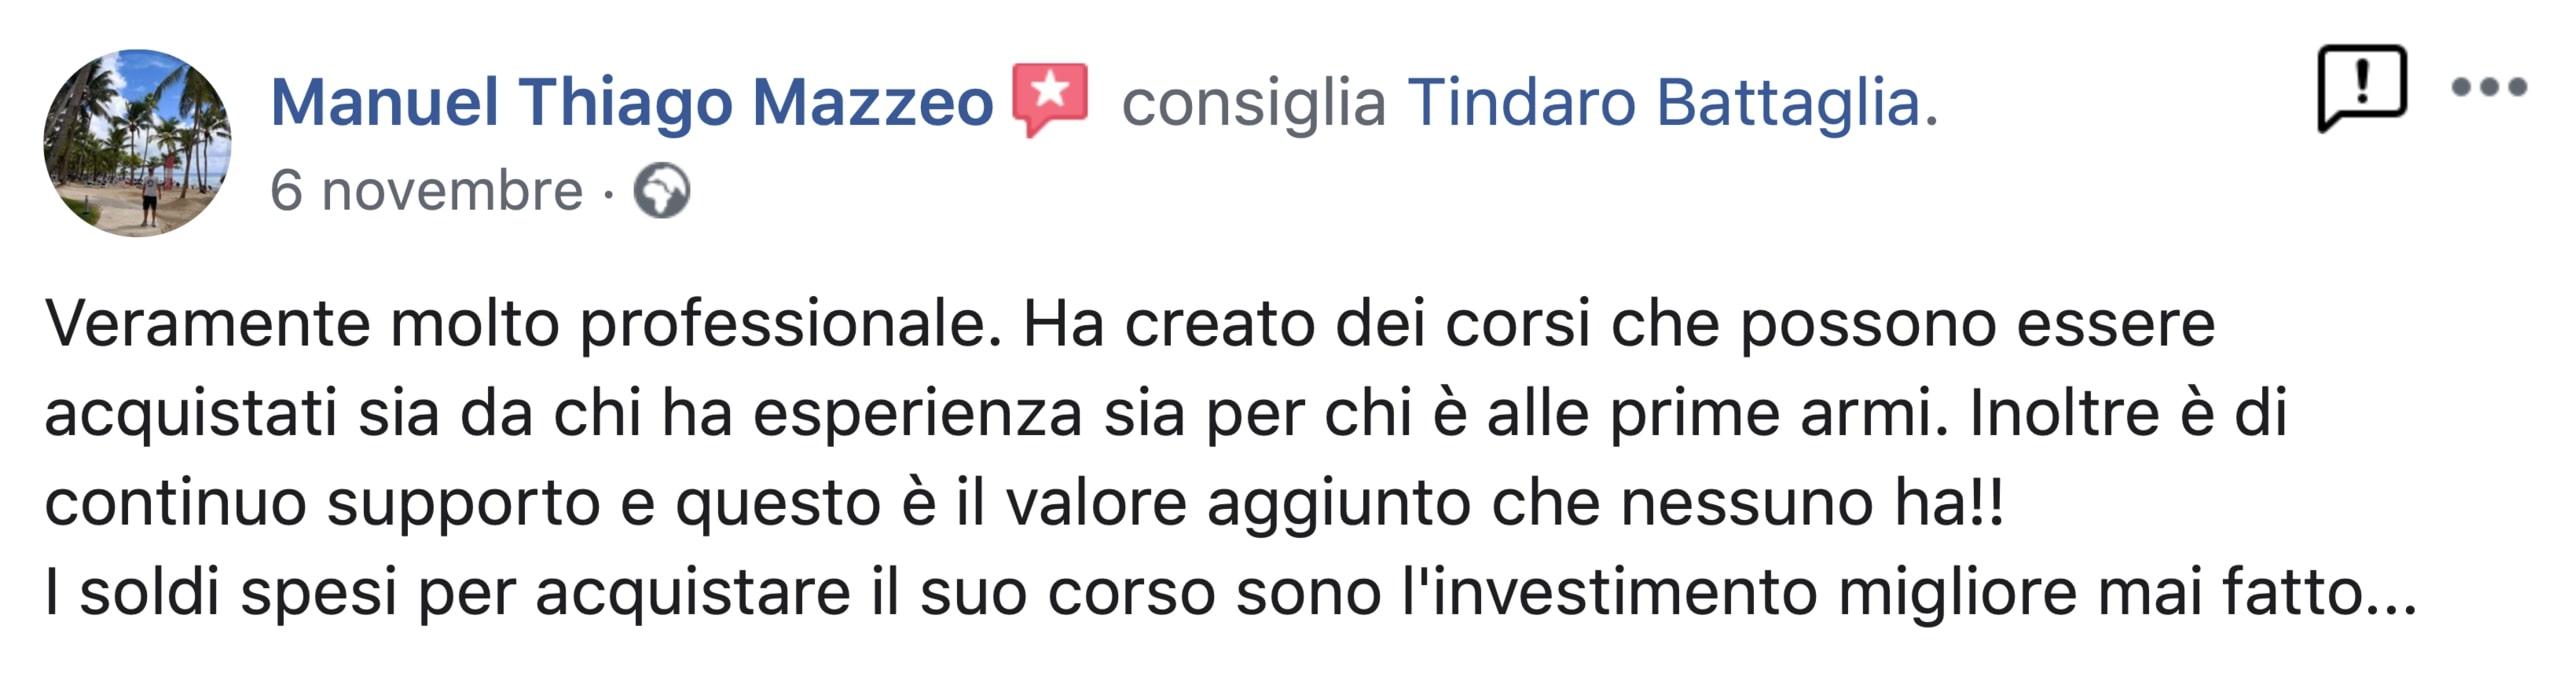 roibook m opinioni Manuel Thiago Mazzeo